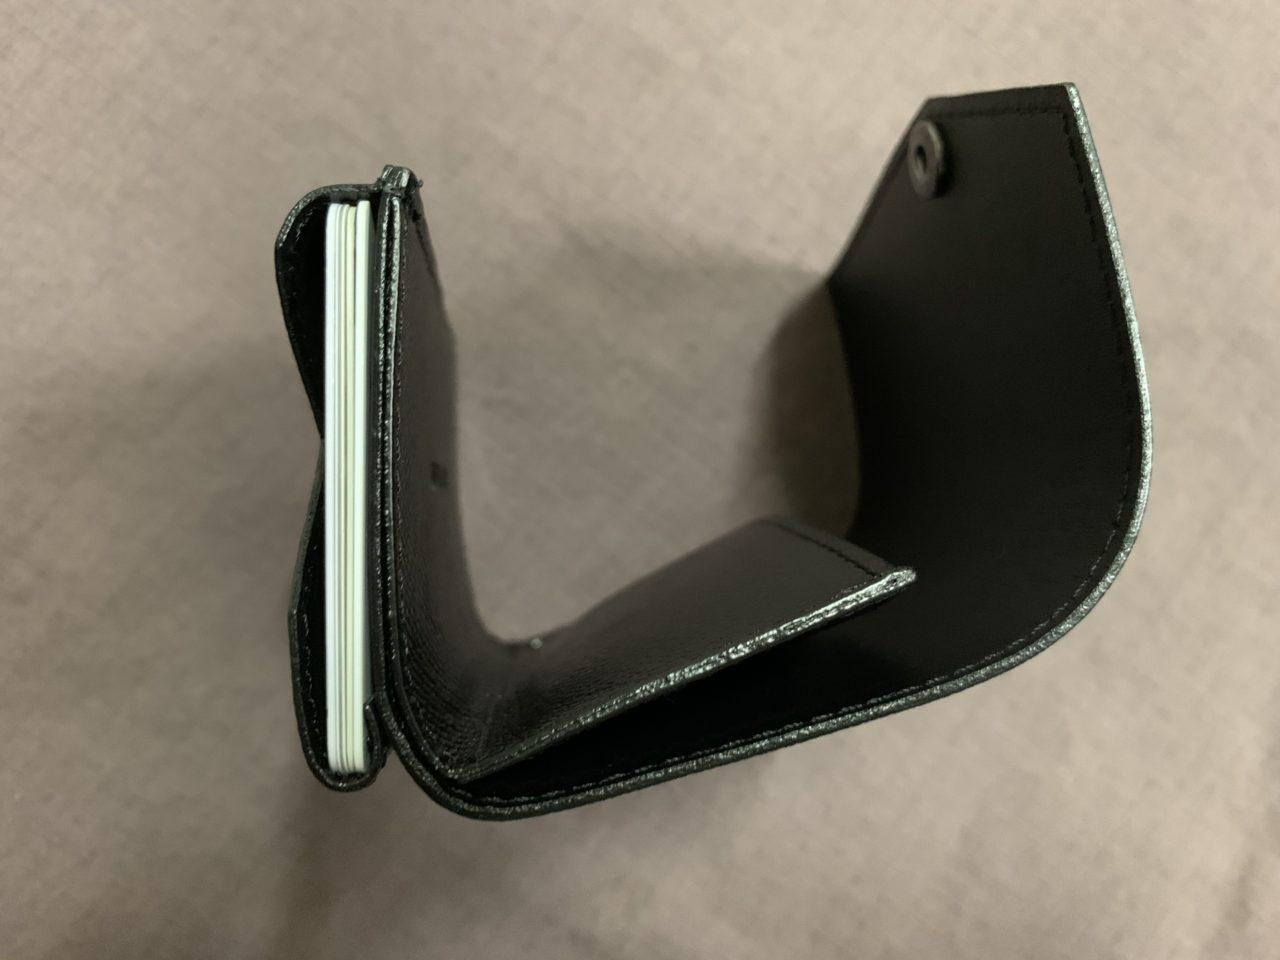 abrAsusの小さい財布をレビューしていきます